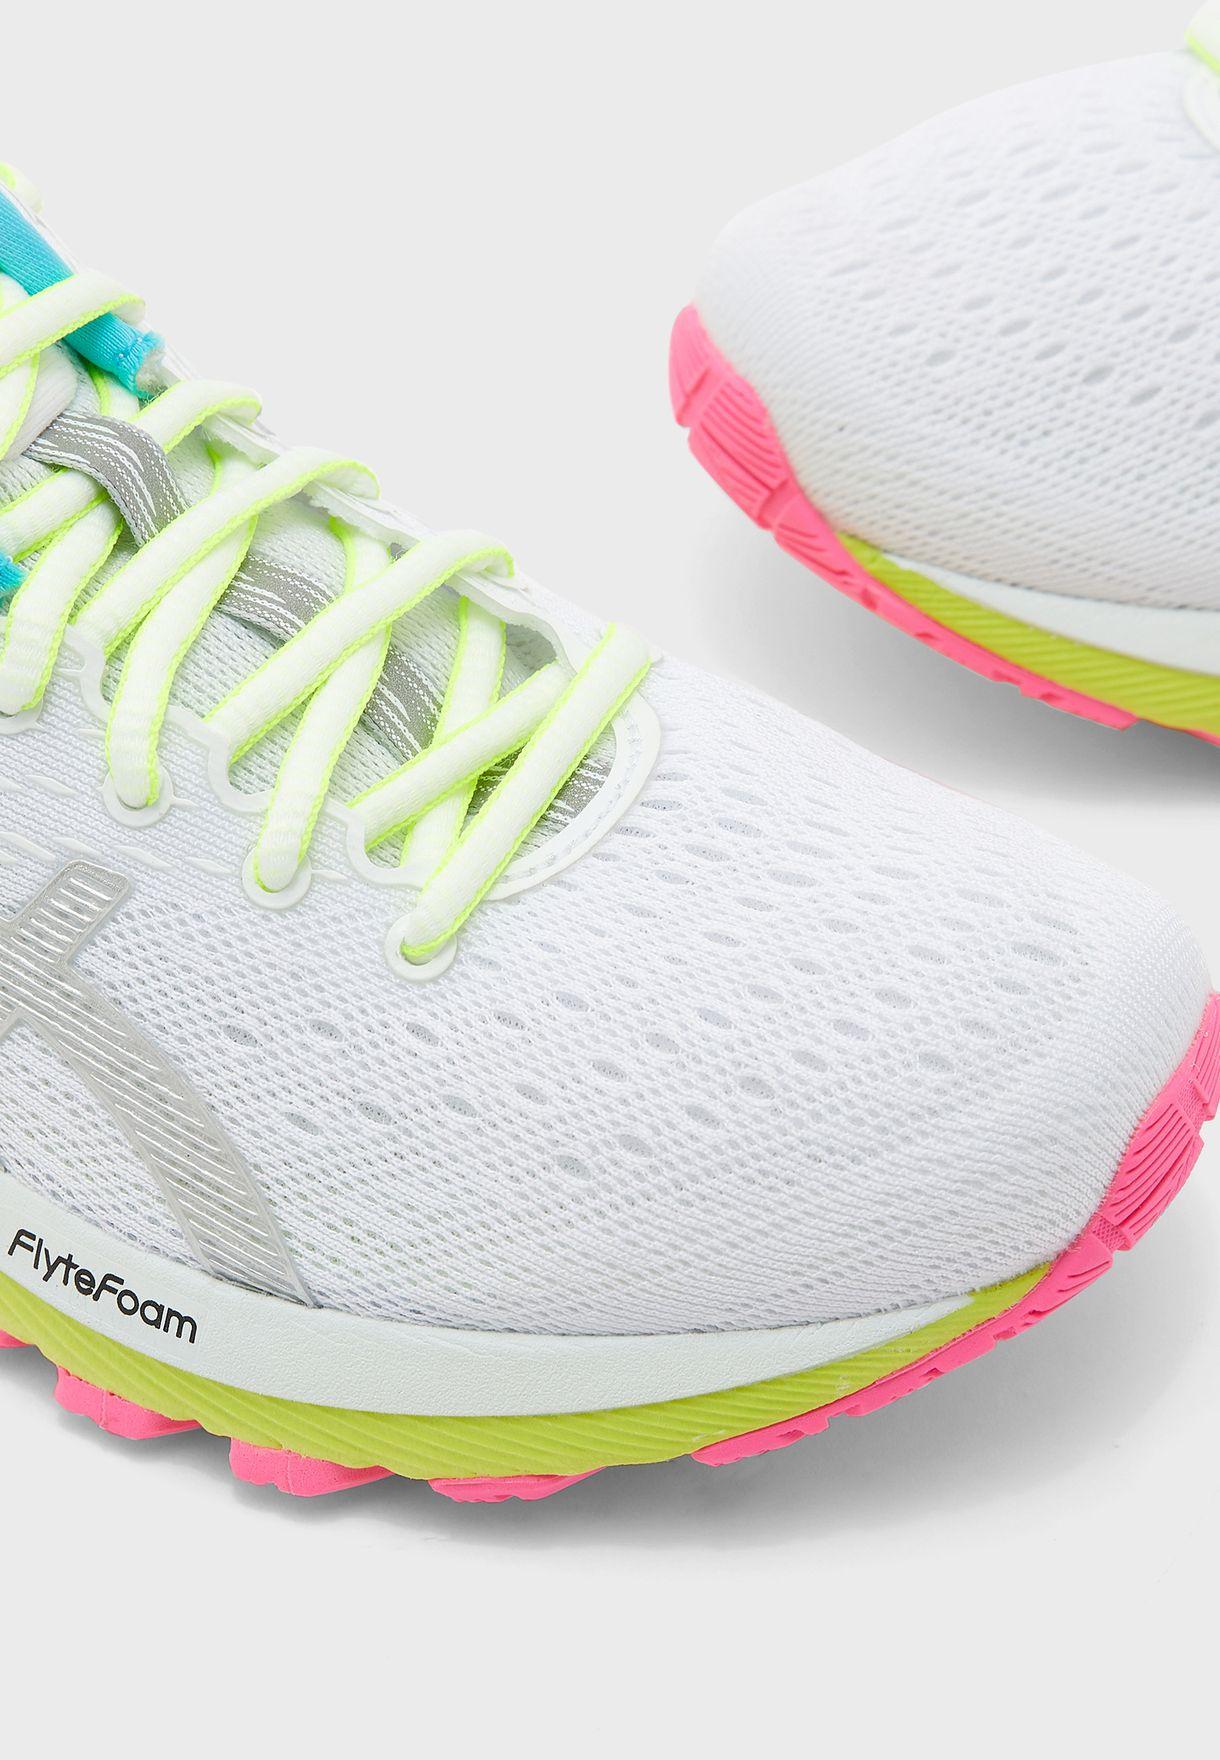 حذاء جيل كومولوس 22 لايت شو